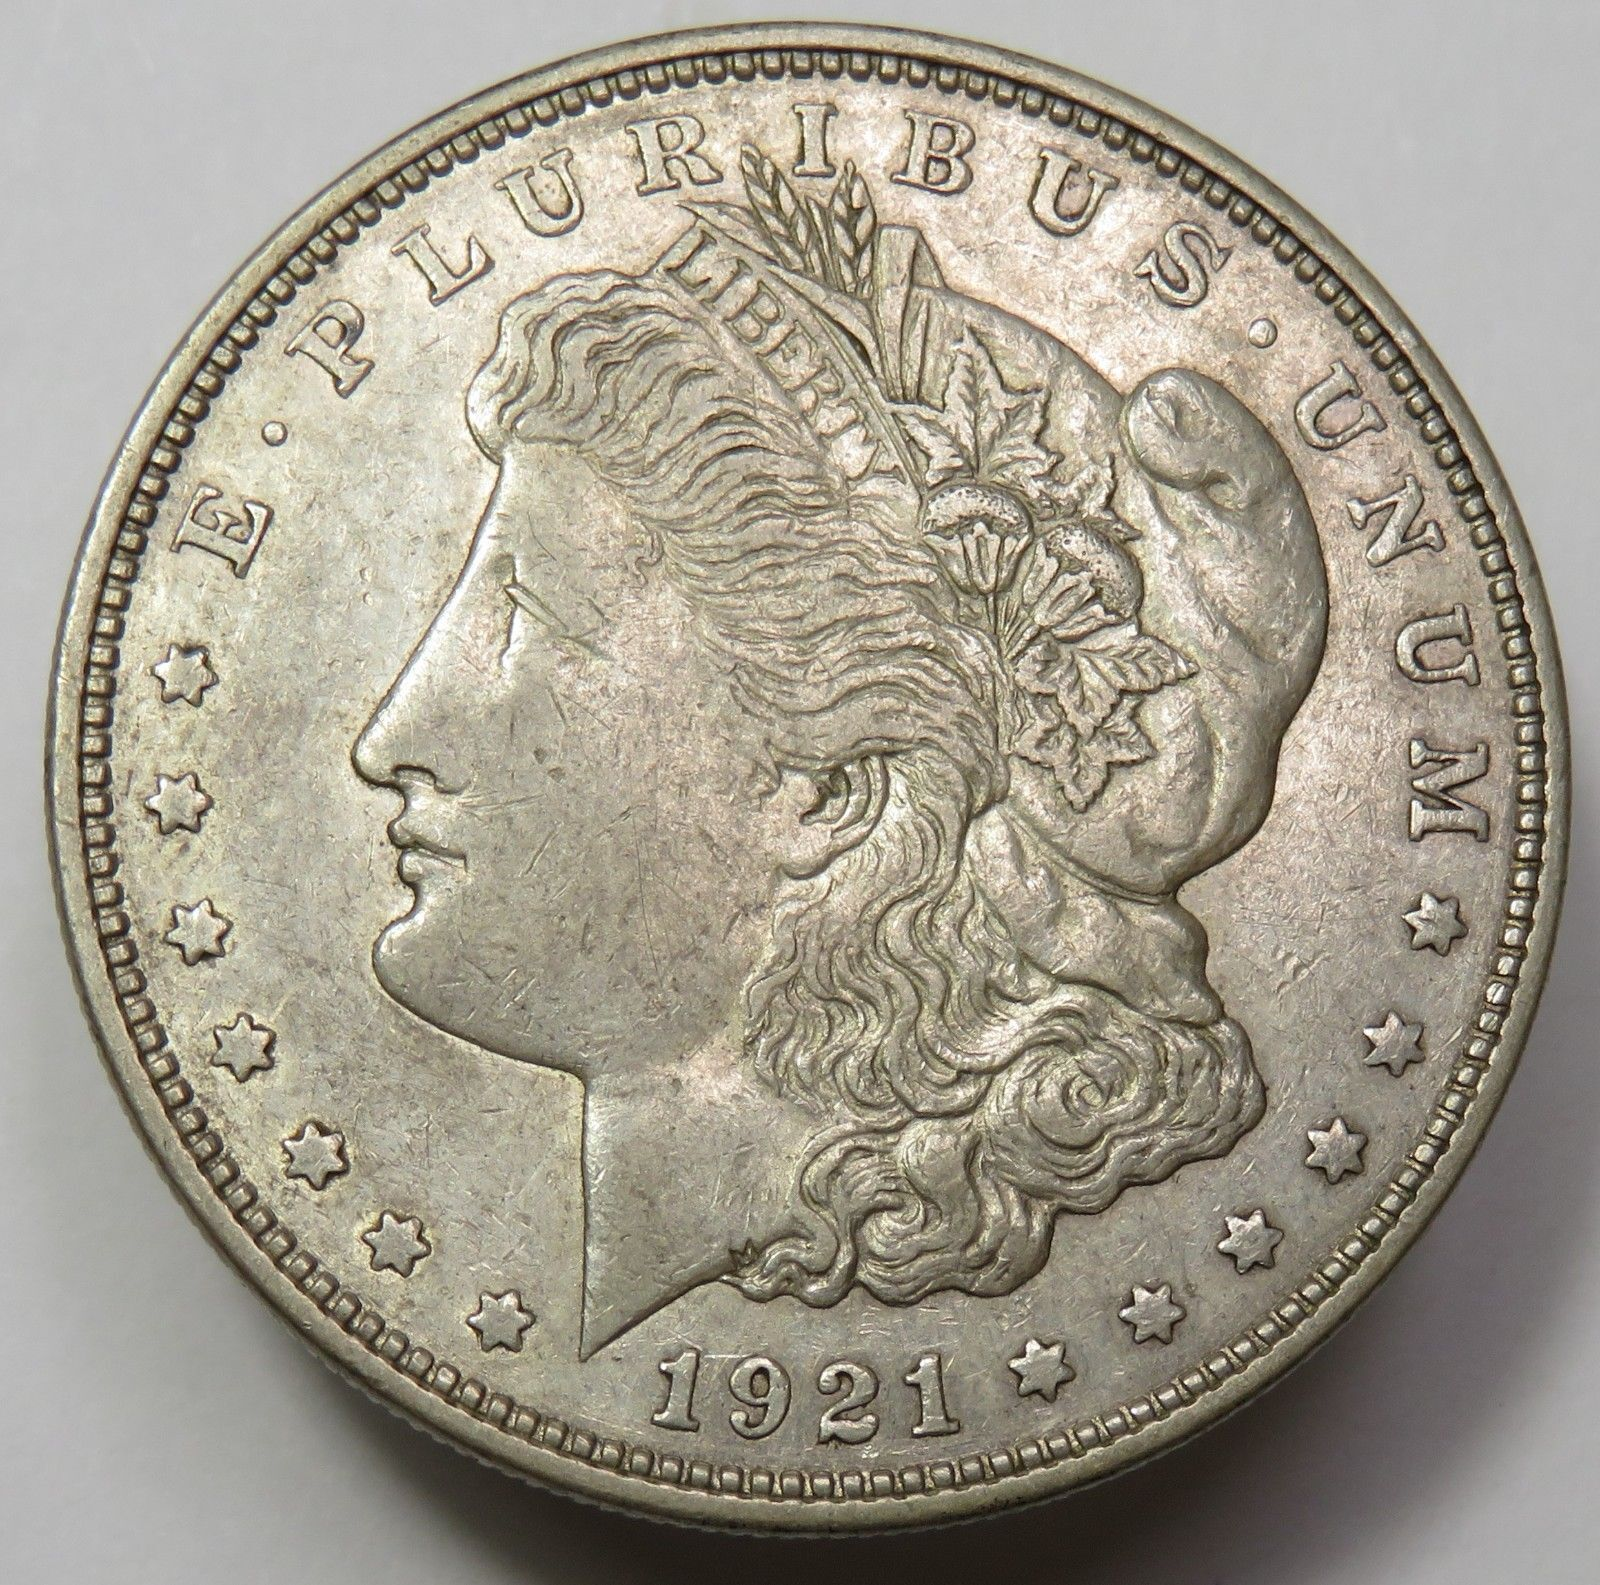 Купить (1) 1921 MORGAN SILVER DOLLAR VG-XF CONDITION! MINT VARIES! SILVER INVESTMENT!